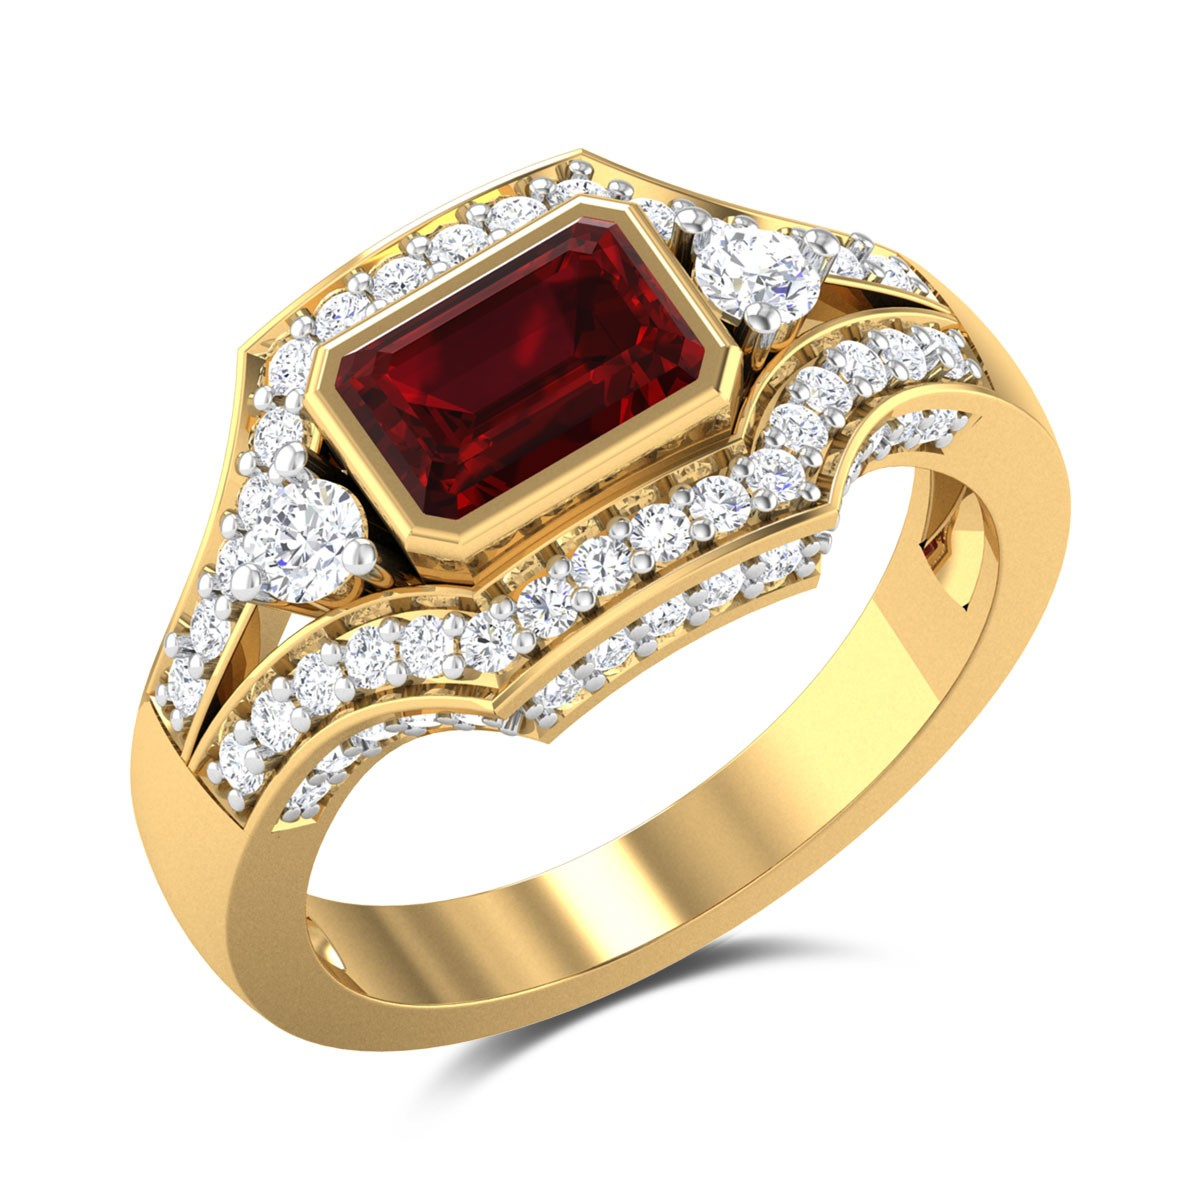 Caladium Diamond Ring